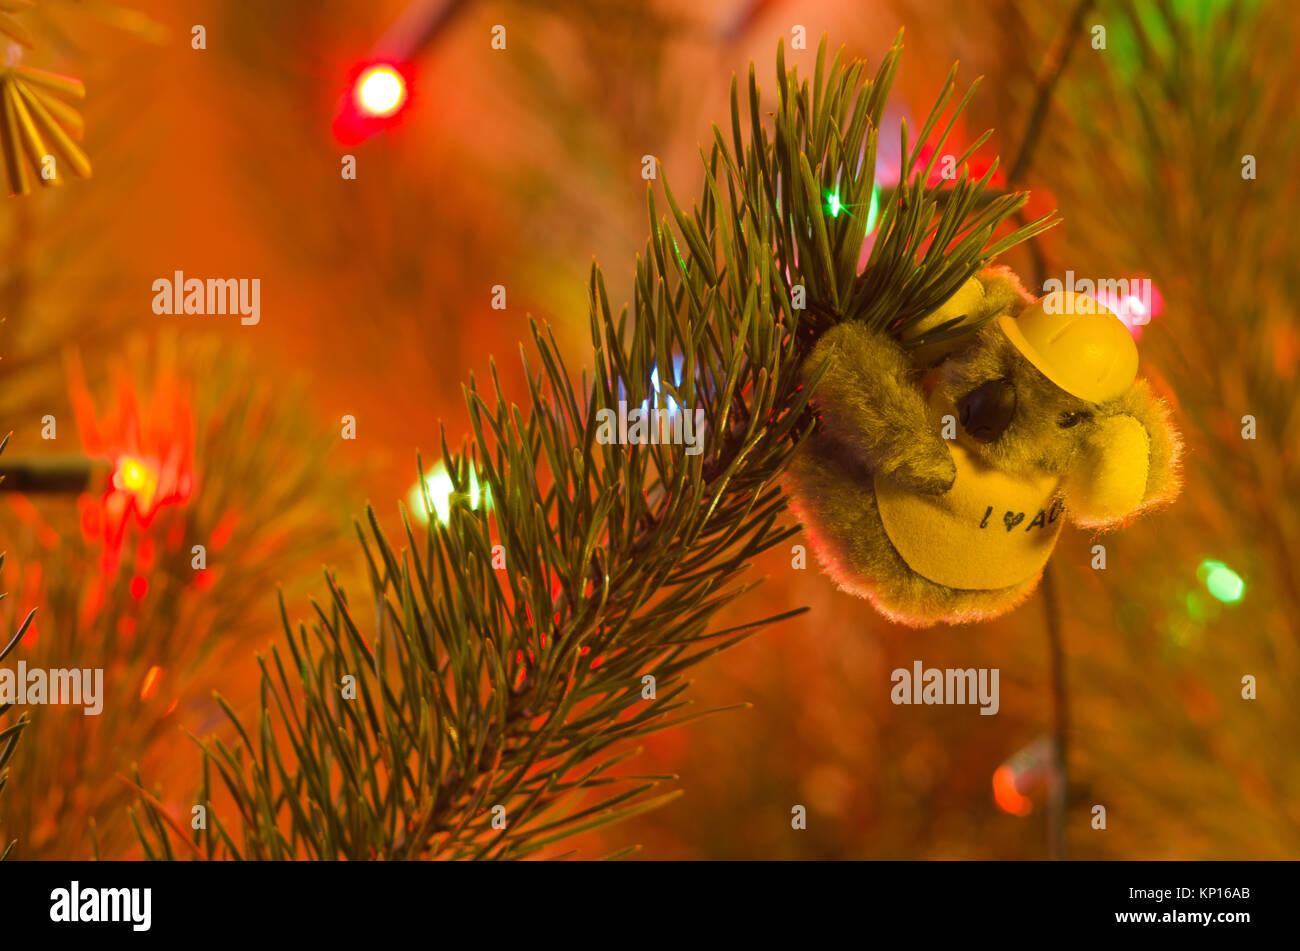 australian christmas decorations stockfotos australian. Black Bedroom Furniture Sets. Home Design Ideas